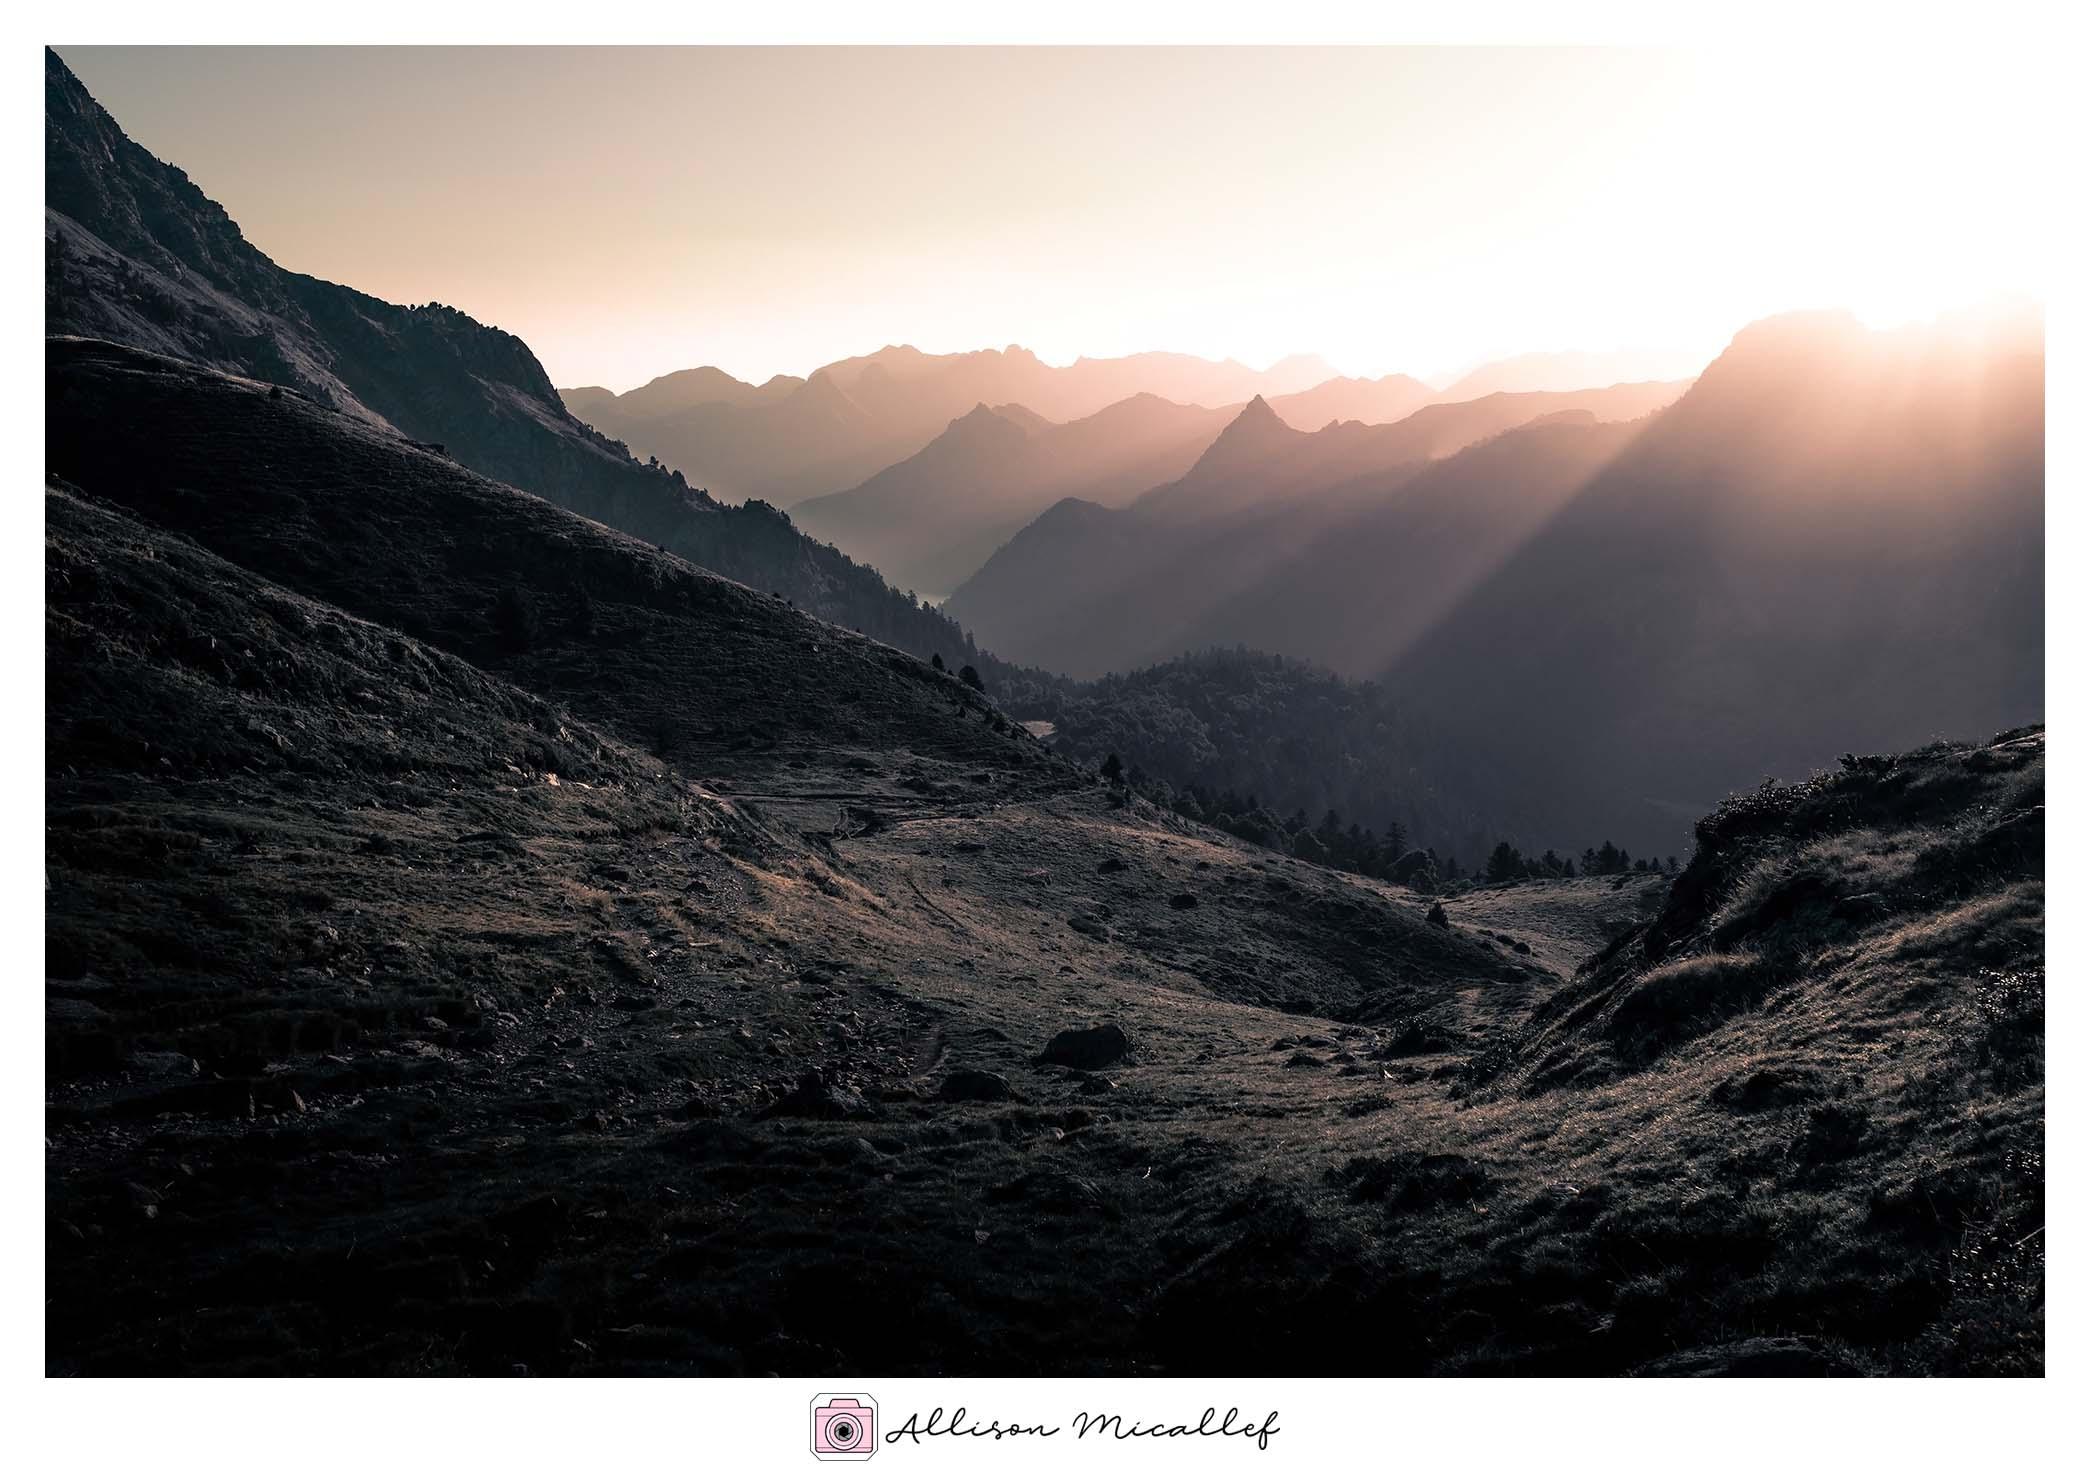 Paysage montagne pyrénées